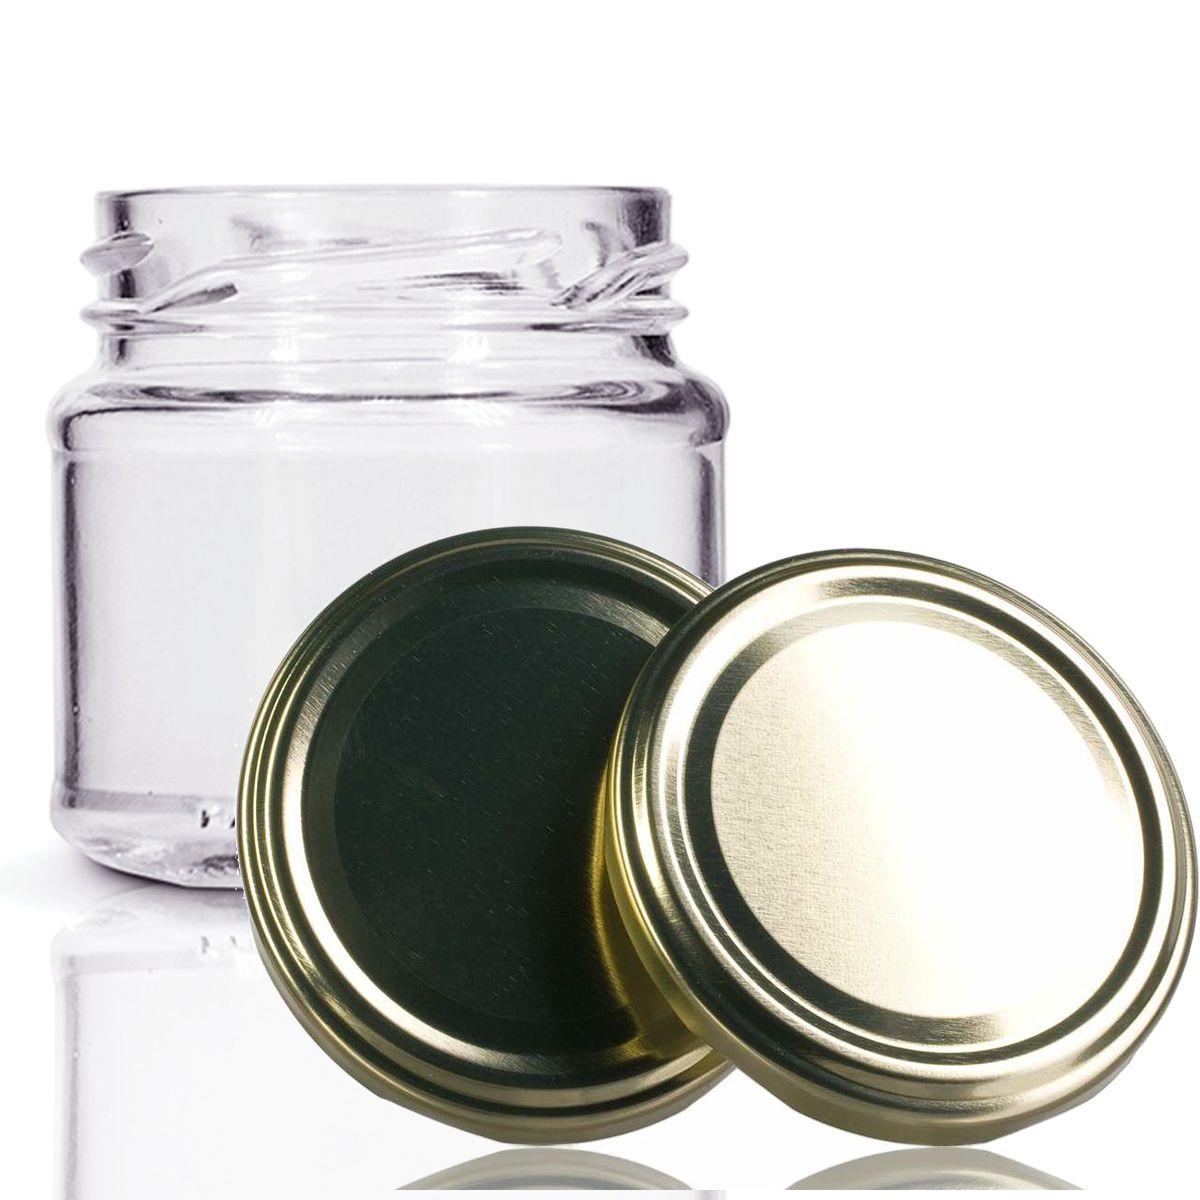 24 Potes De Vidro Mini Belém 150 Ml Tampa Dourada + Lacre  - EMPÓRIO PACK